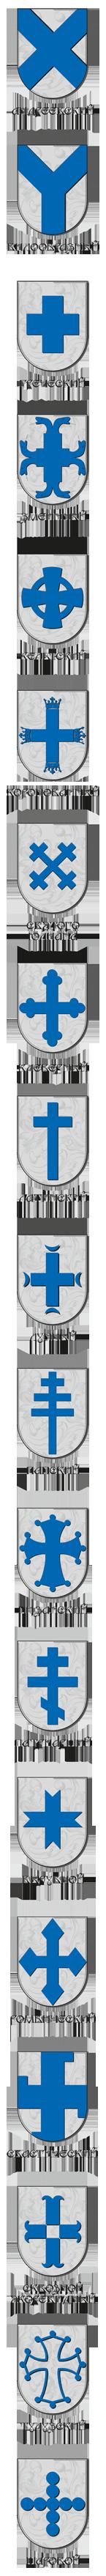 Cross-left